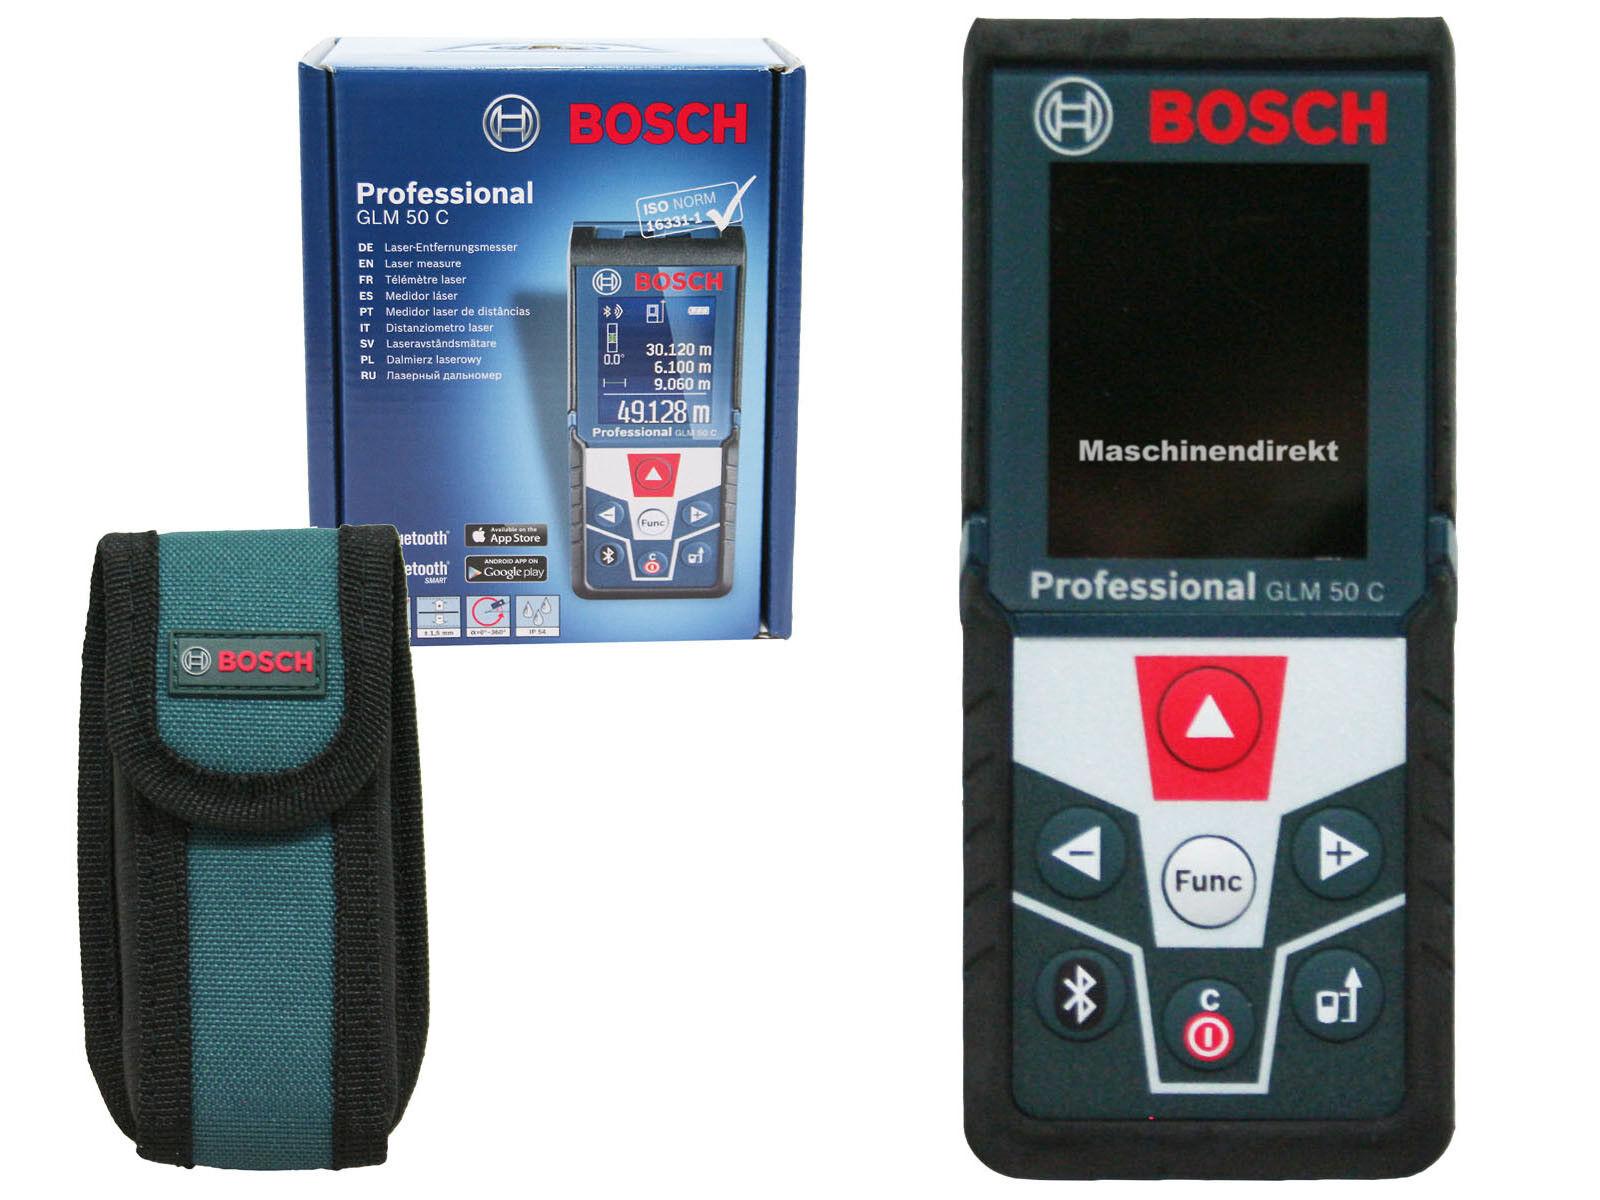 Bosch glm c professional laser entfernungsmesser ebay